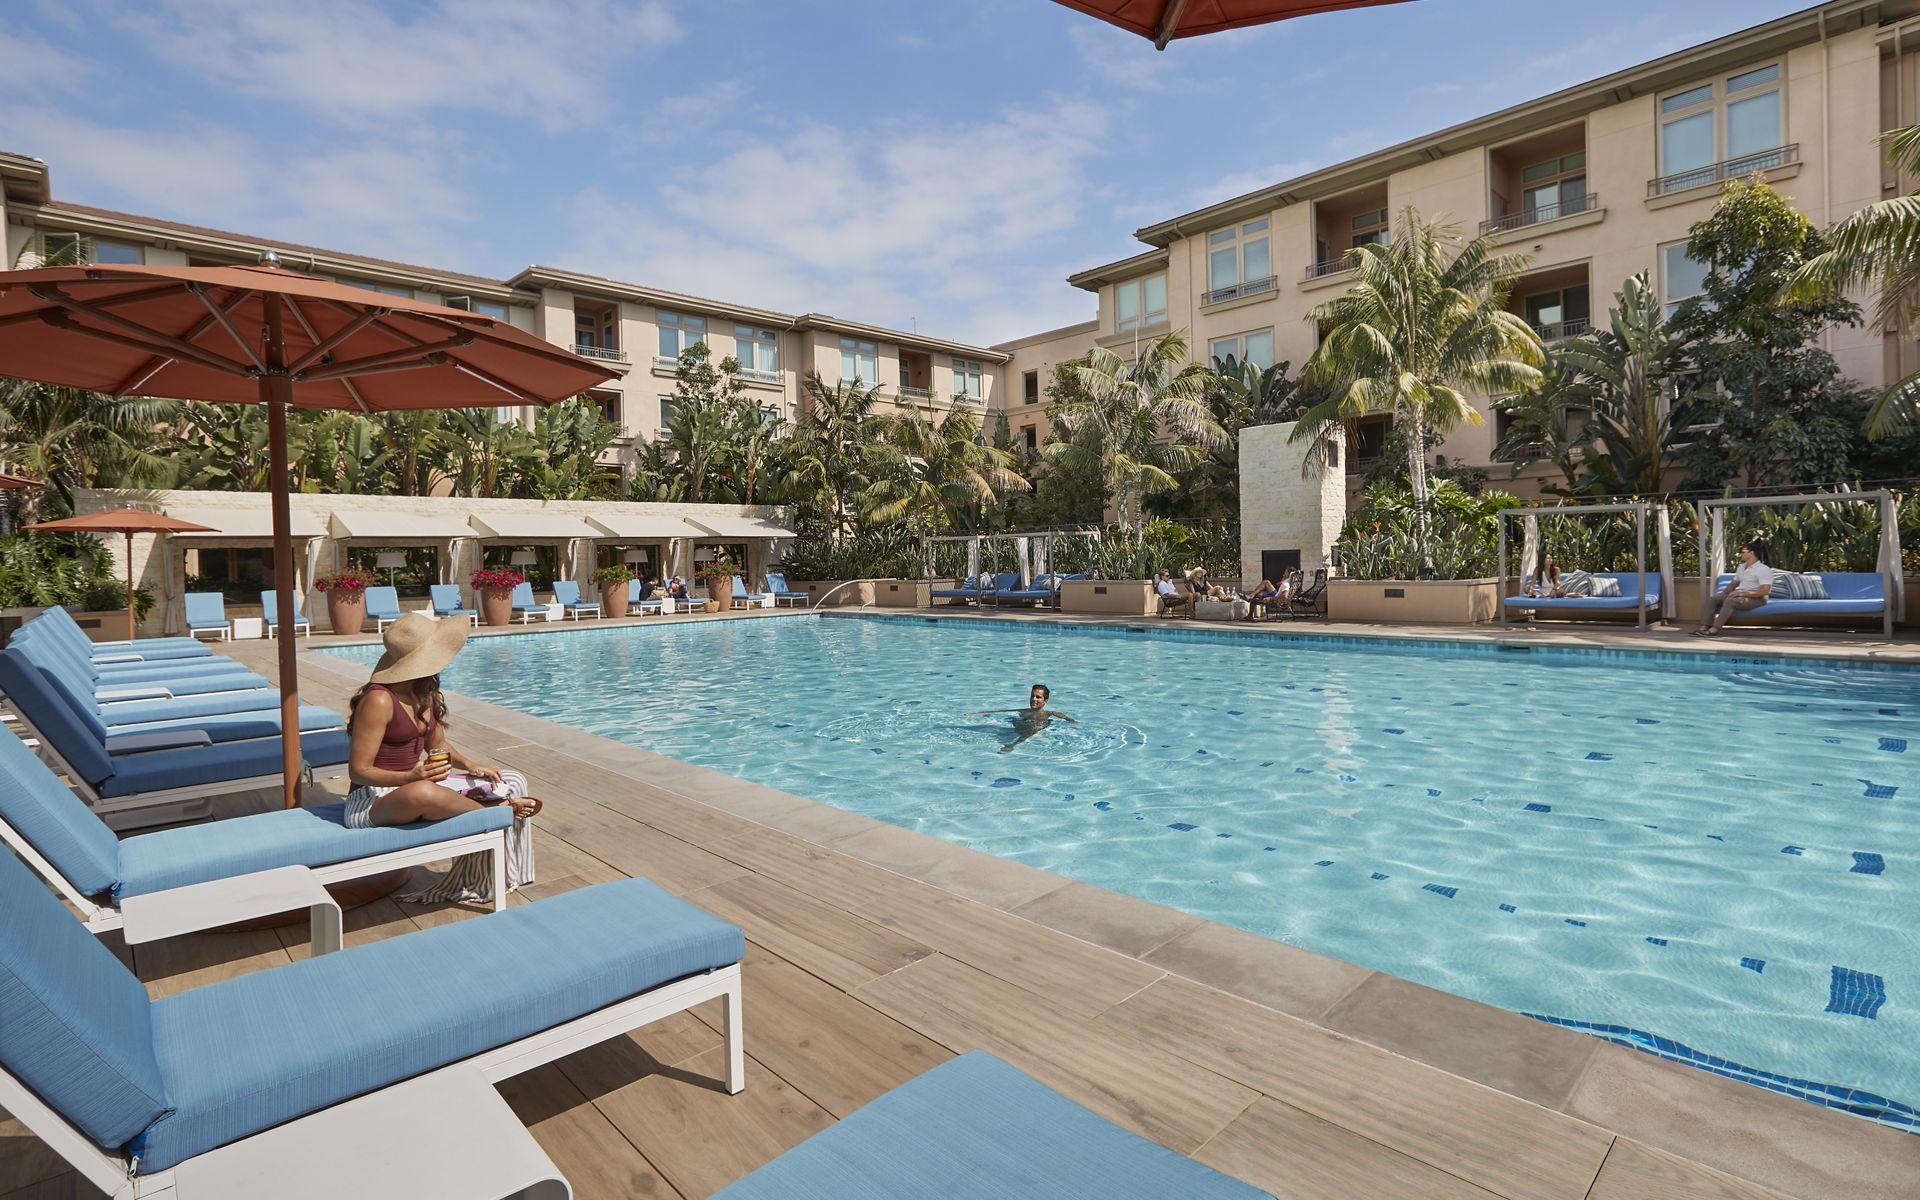 Exterior view of people spending time by pool at Villas at Playa Vista Apartment Homes in Playa Vista, CA.